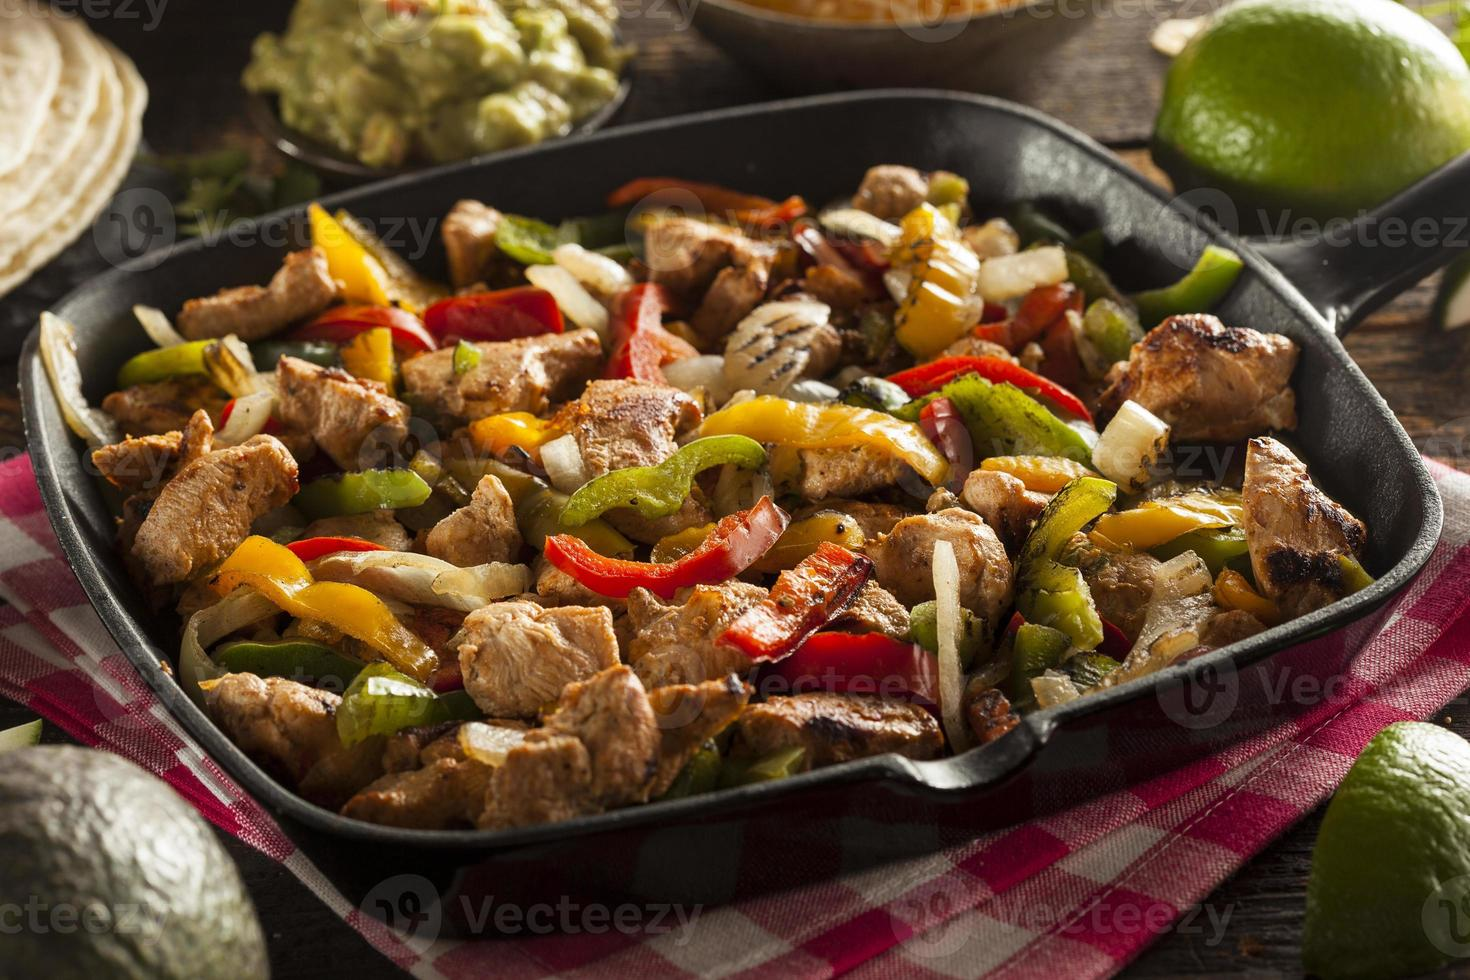 Homemade Chicken Fajitas with Vegetables photo